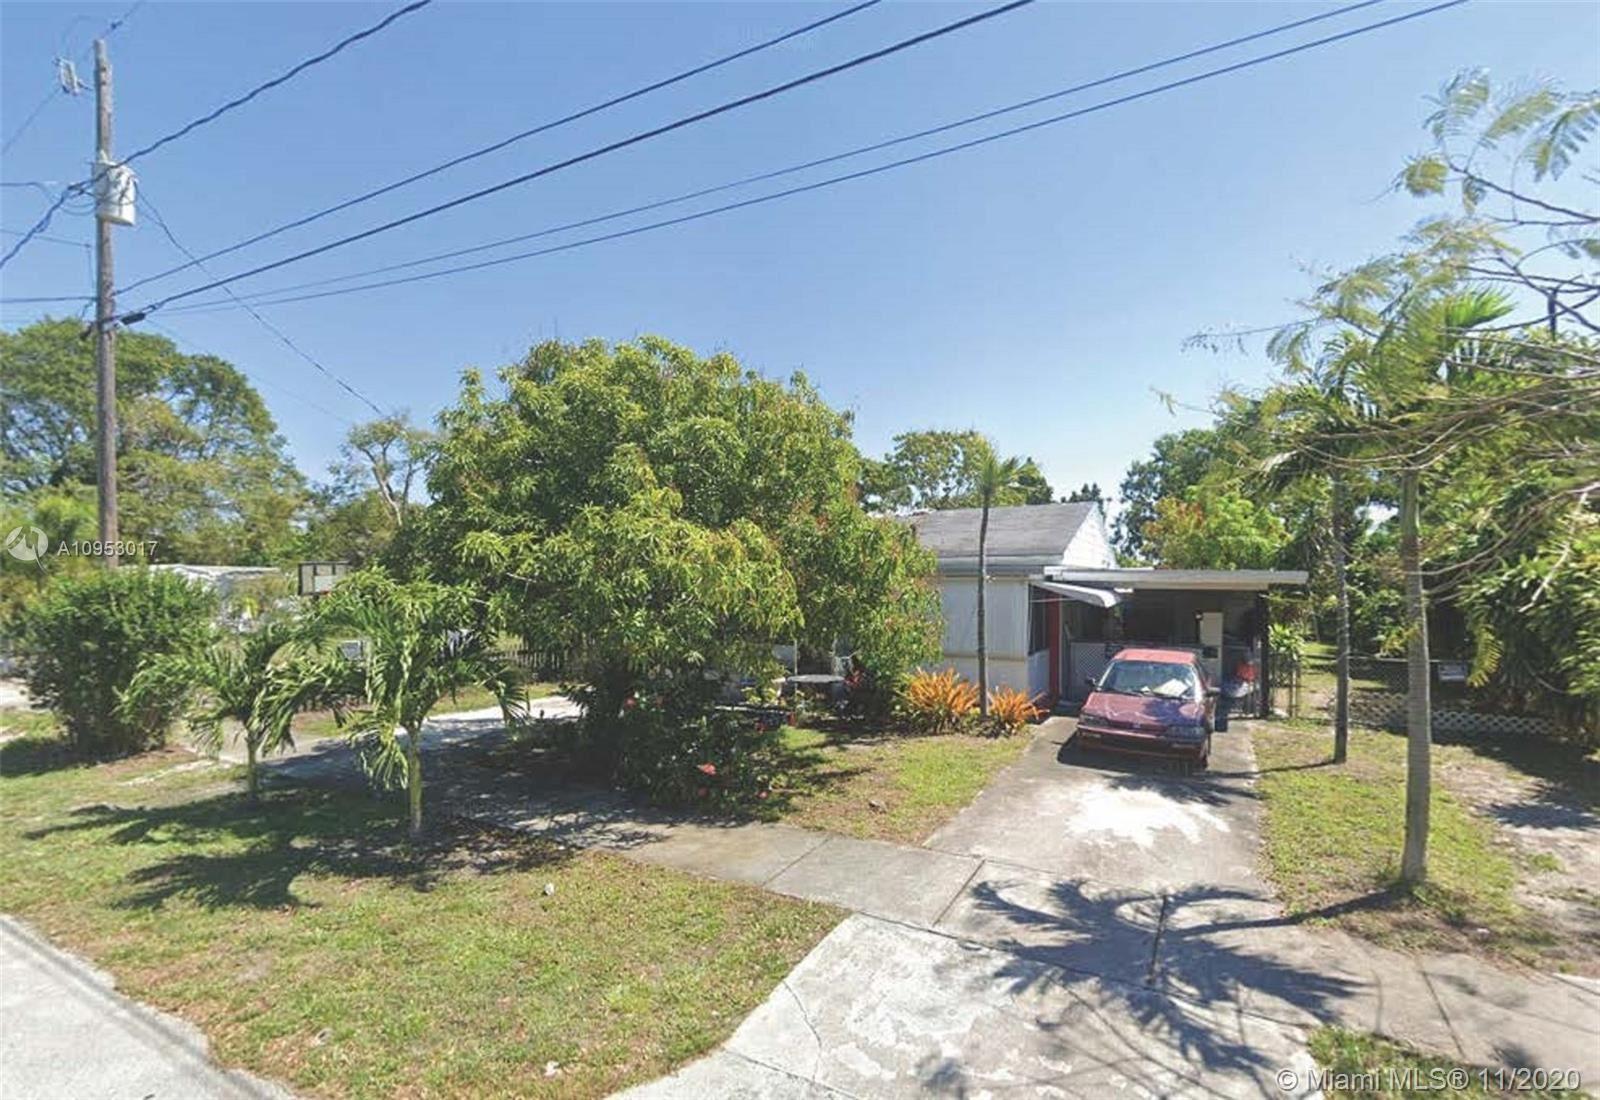 Photo of 523 SW 5th Ave, Hallandale Beach, FL 33009 (MLS # A10953017)